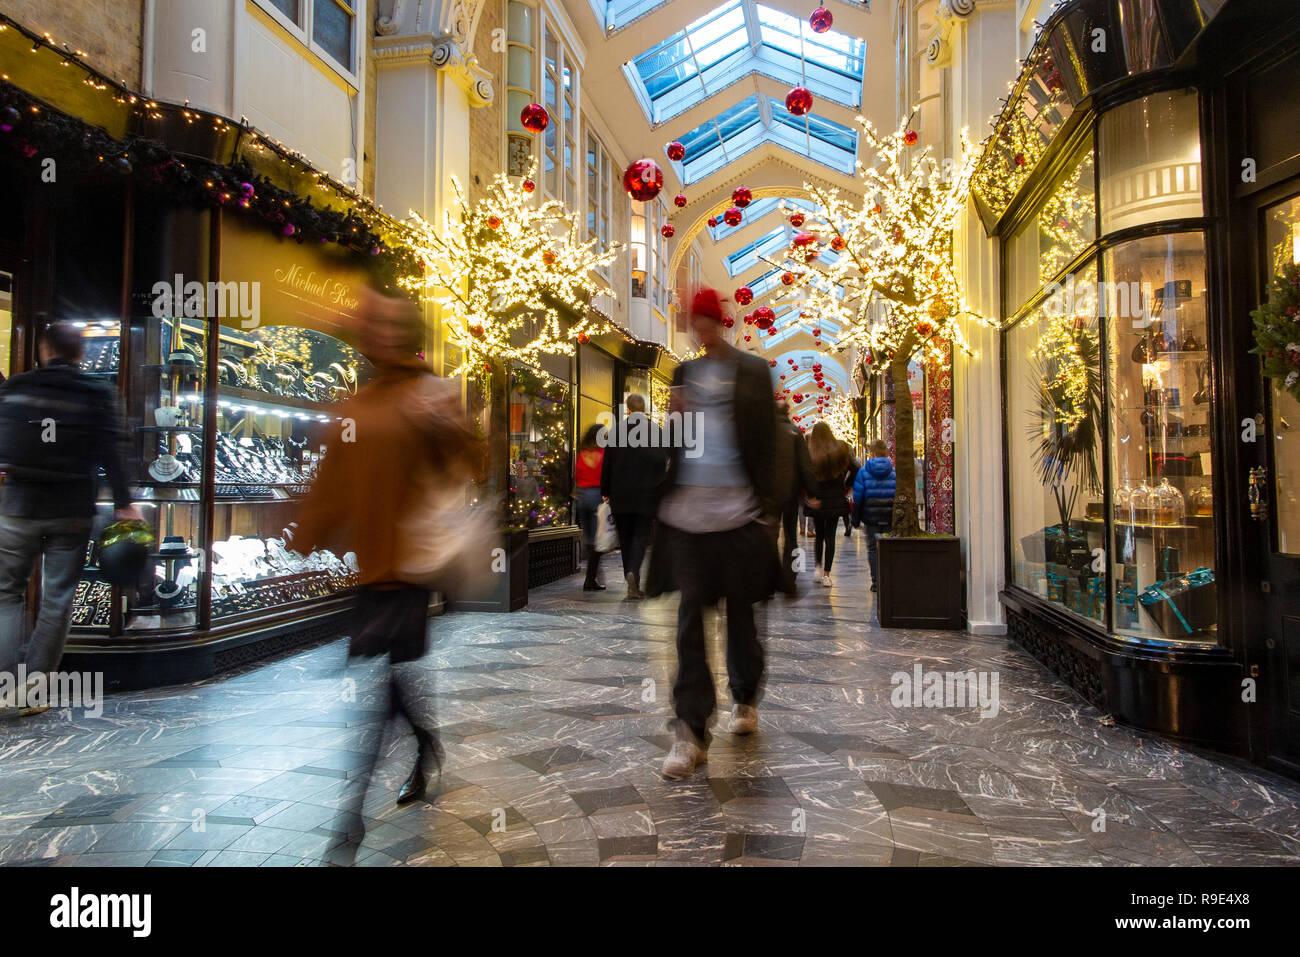 Burlington Arcade in Mayfair, London at Christmas time - Stock Image